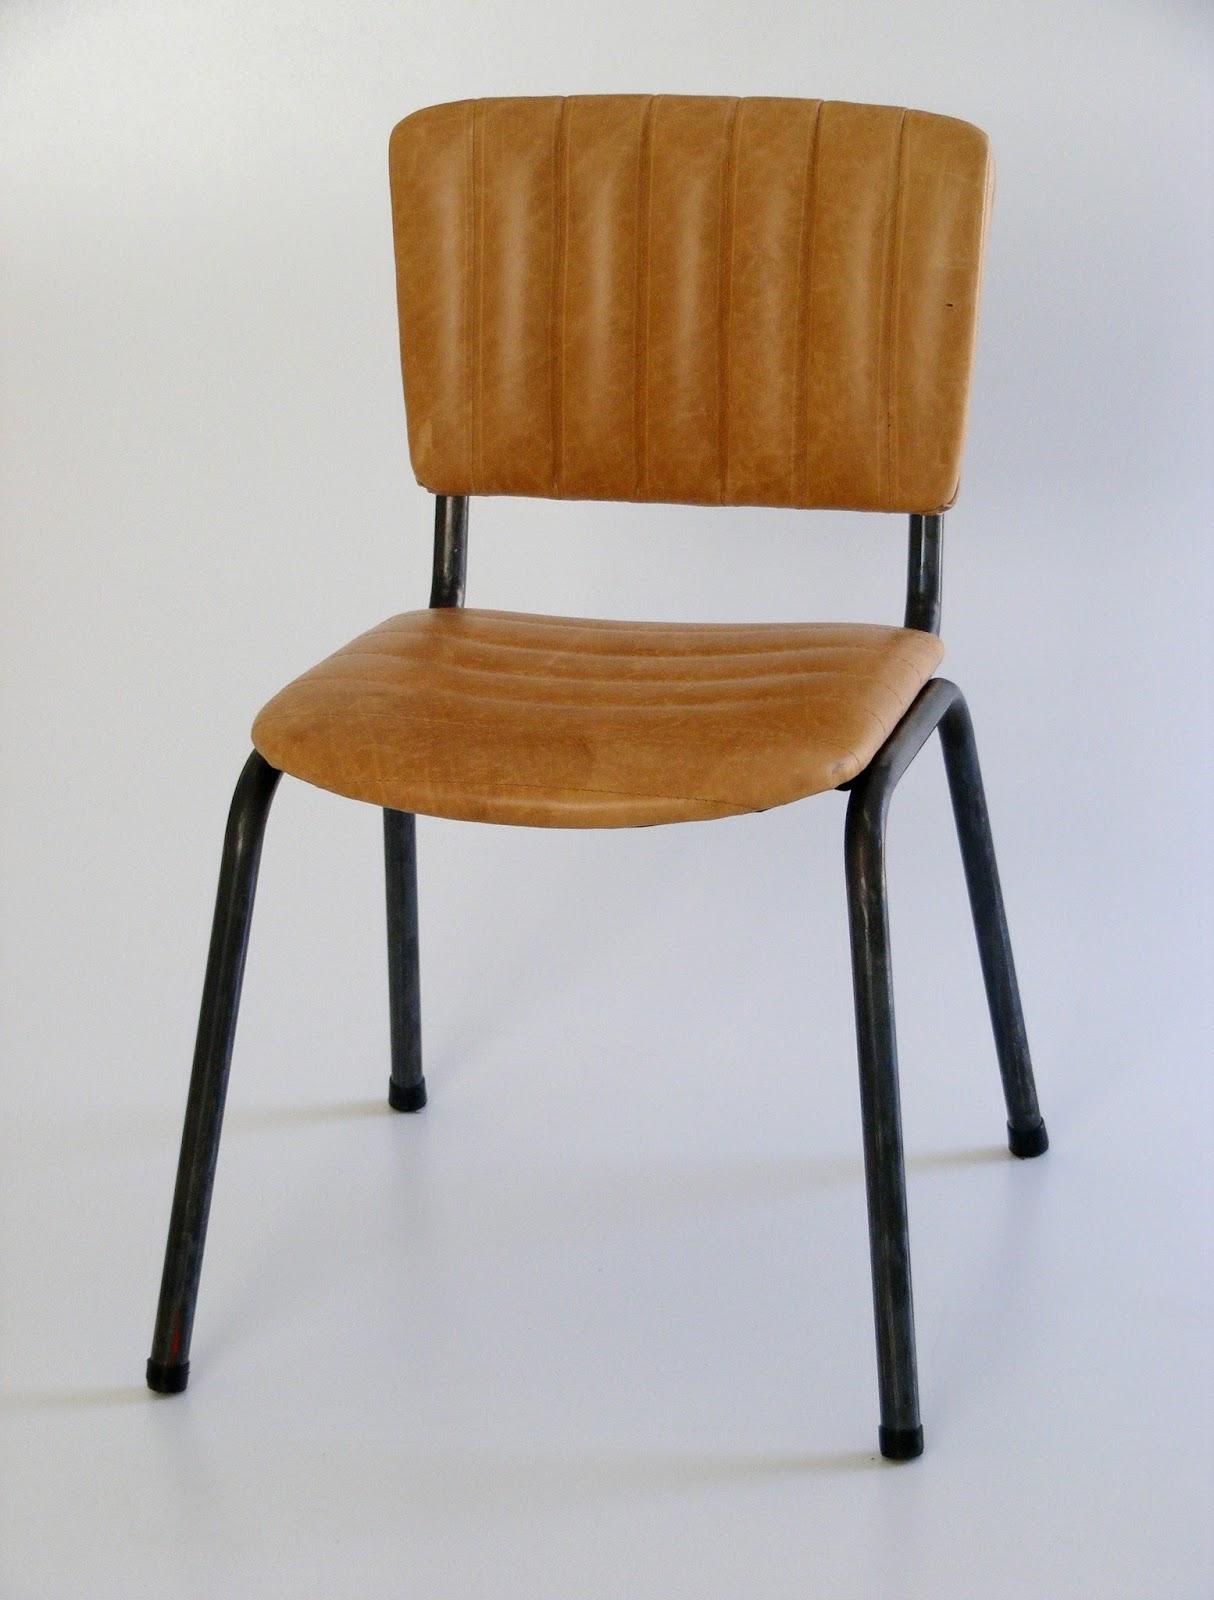 VAMP FURNITURE This weeks new vintage furniture stock_22